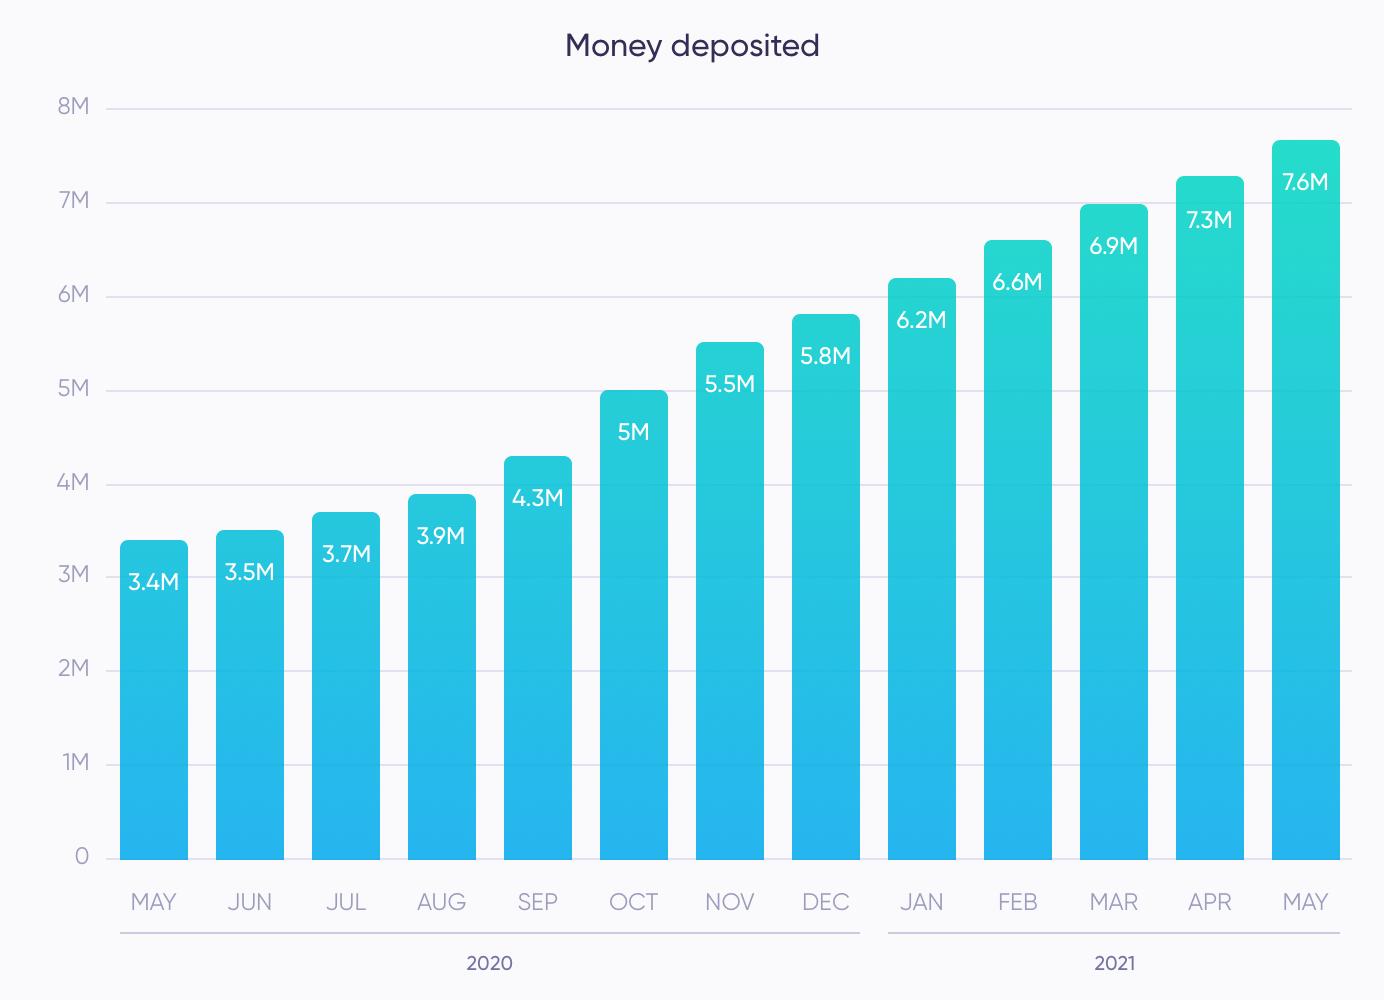 Money deposited (May)